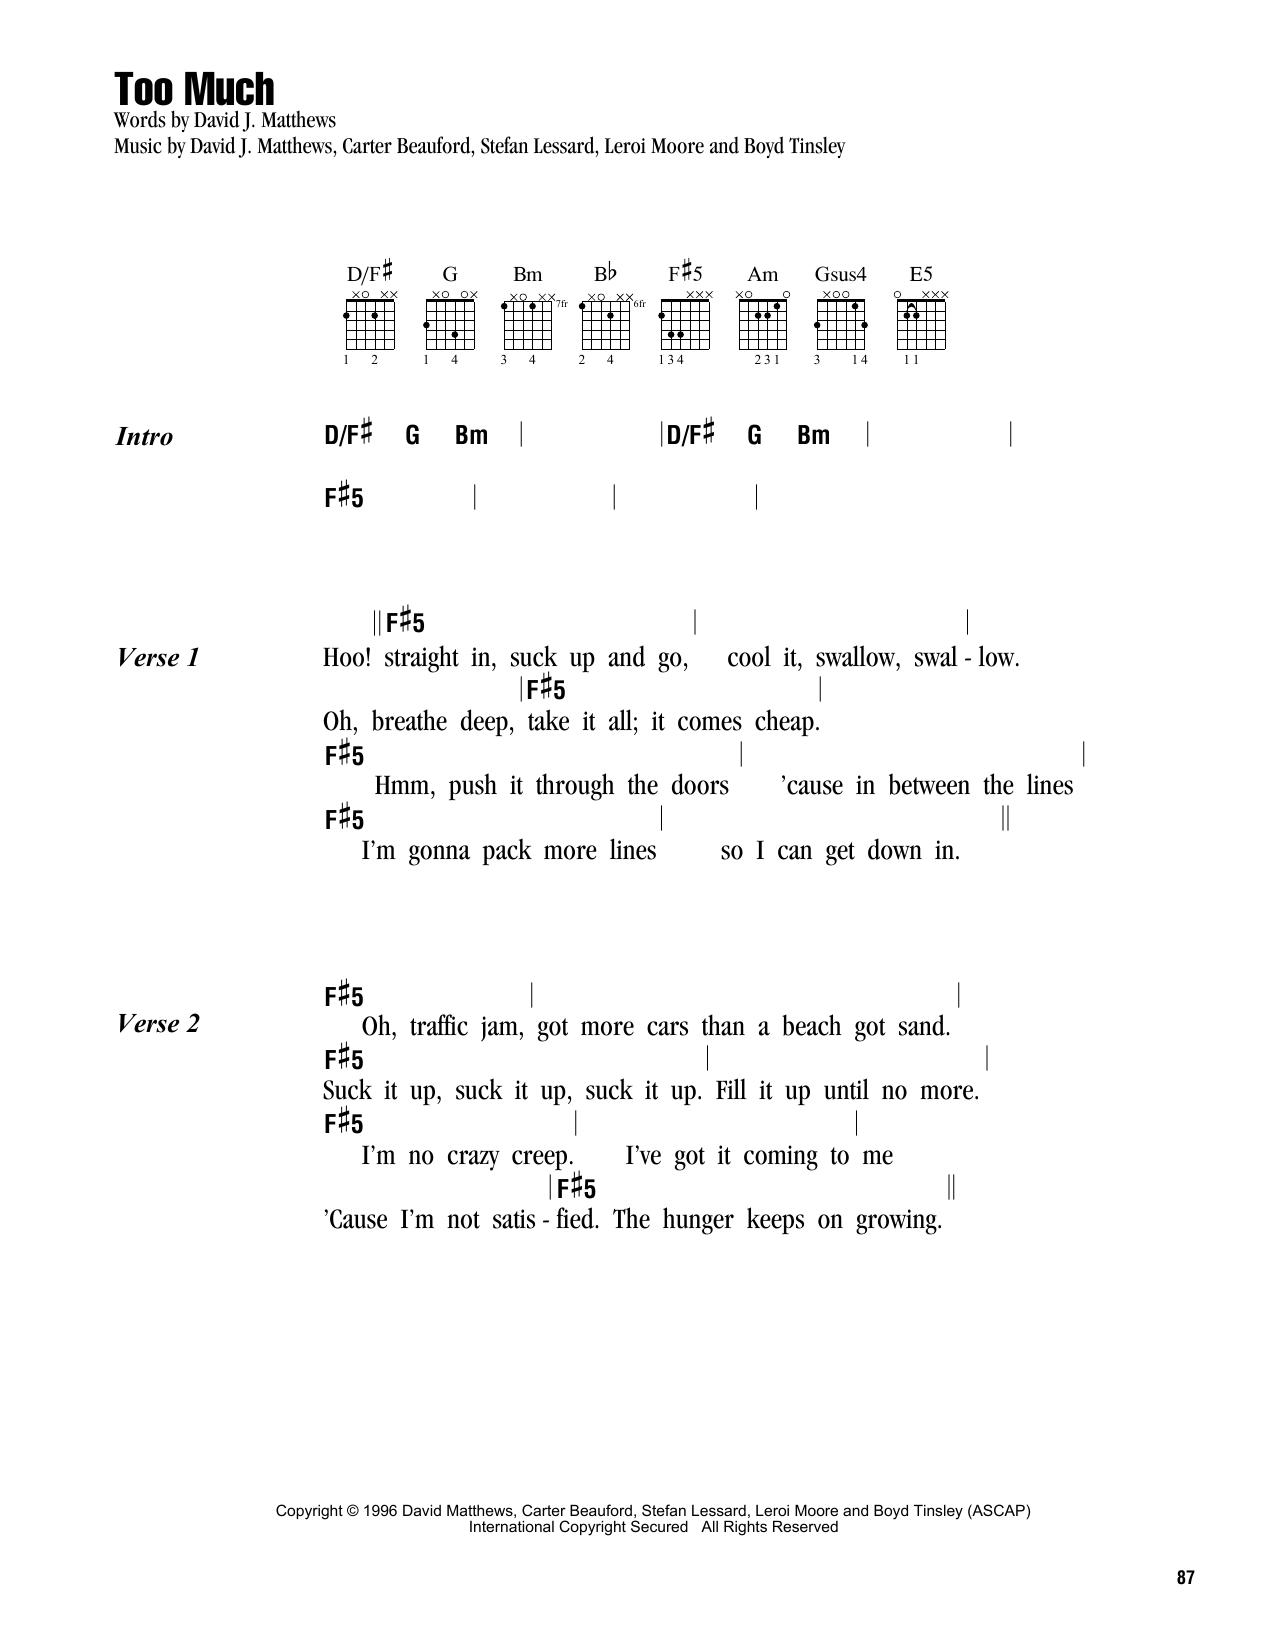 Too Much by Dave Matthews Band - Guitar Chords/Lyrics - Guitar Instructor